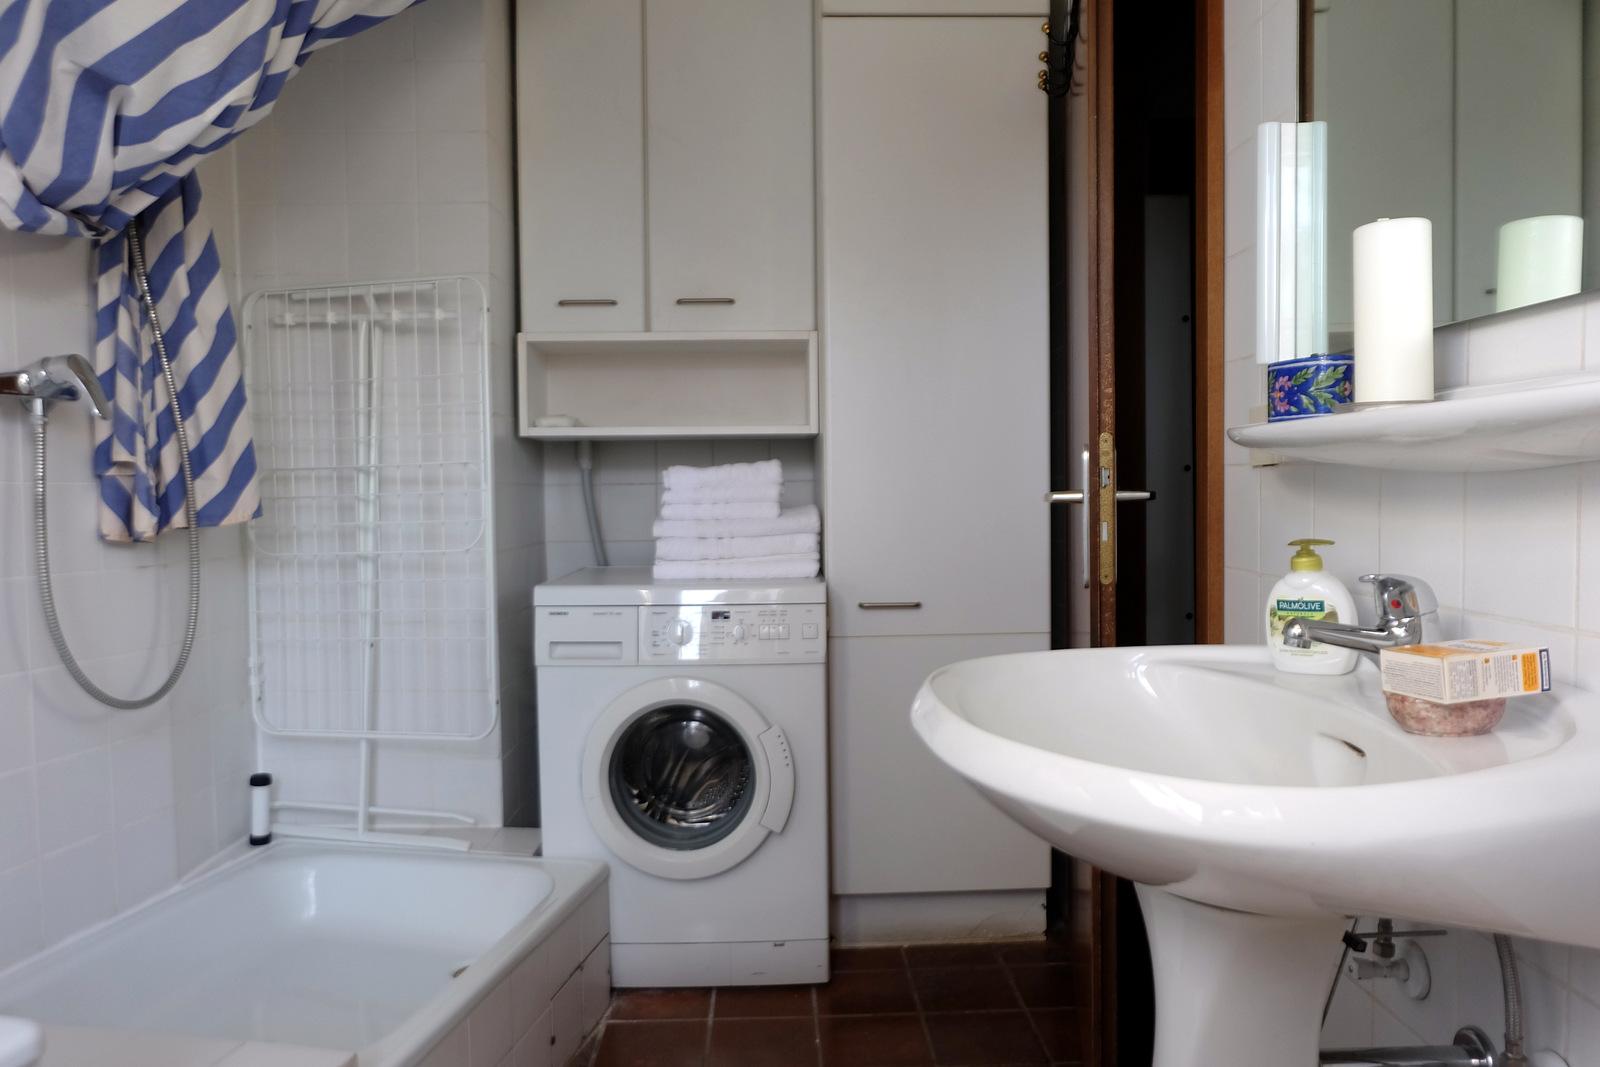 dscf1528 Roof apartment %Bockenheim